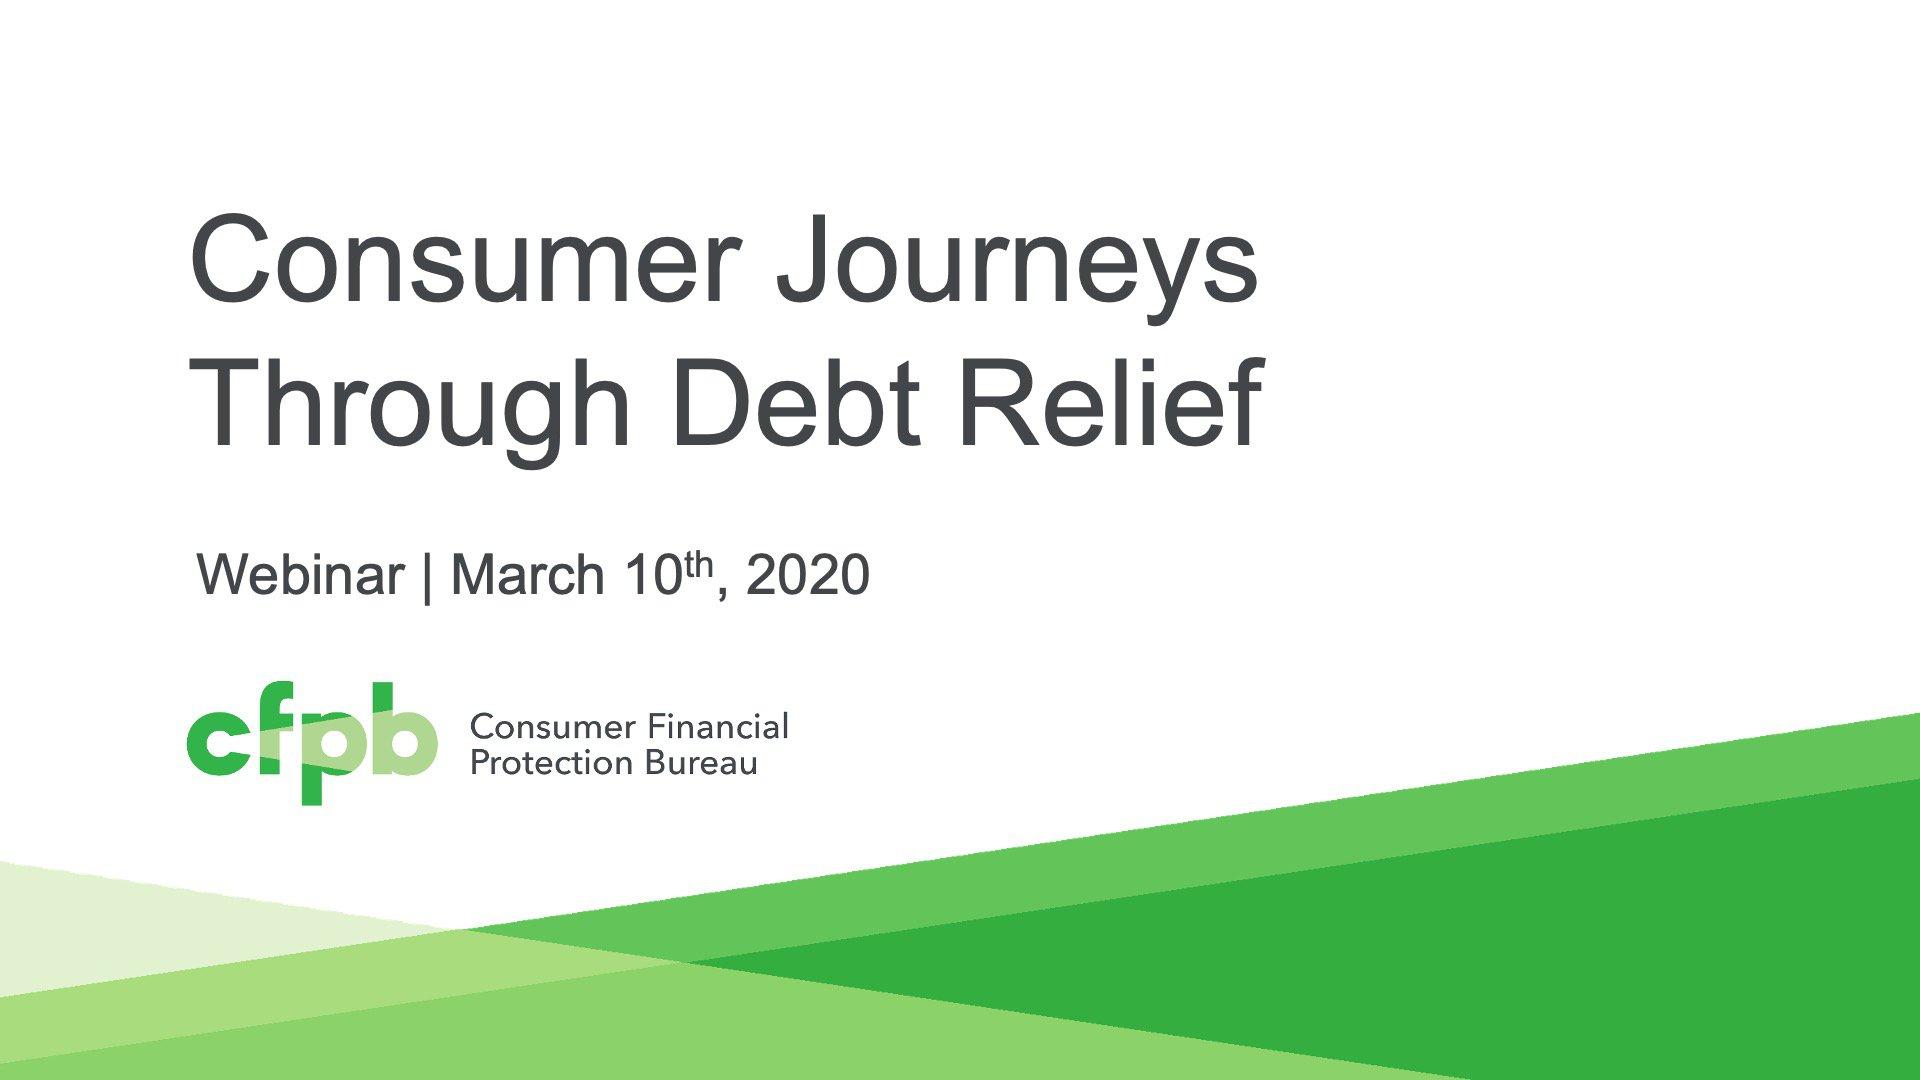 Session 4: Consumer Journeys Through Debt Relief